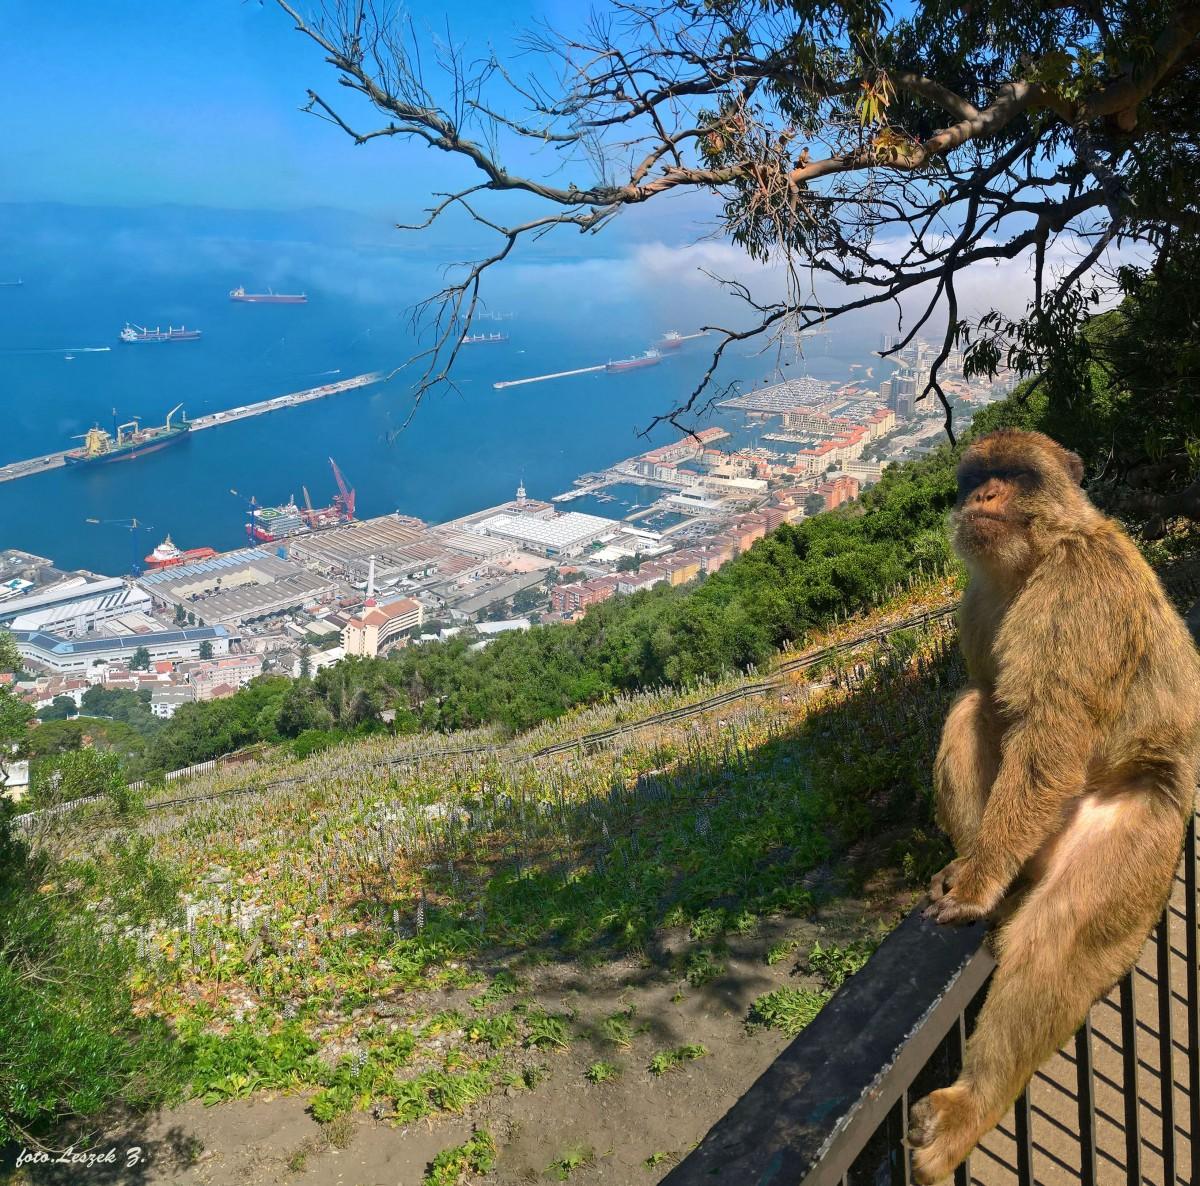 Zdjęcia: Gibraltar,, Gibraltar., Magot gibraltarski (Makak gibraltarski), GIBRALTAR